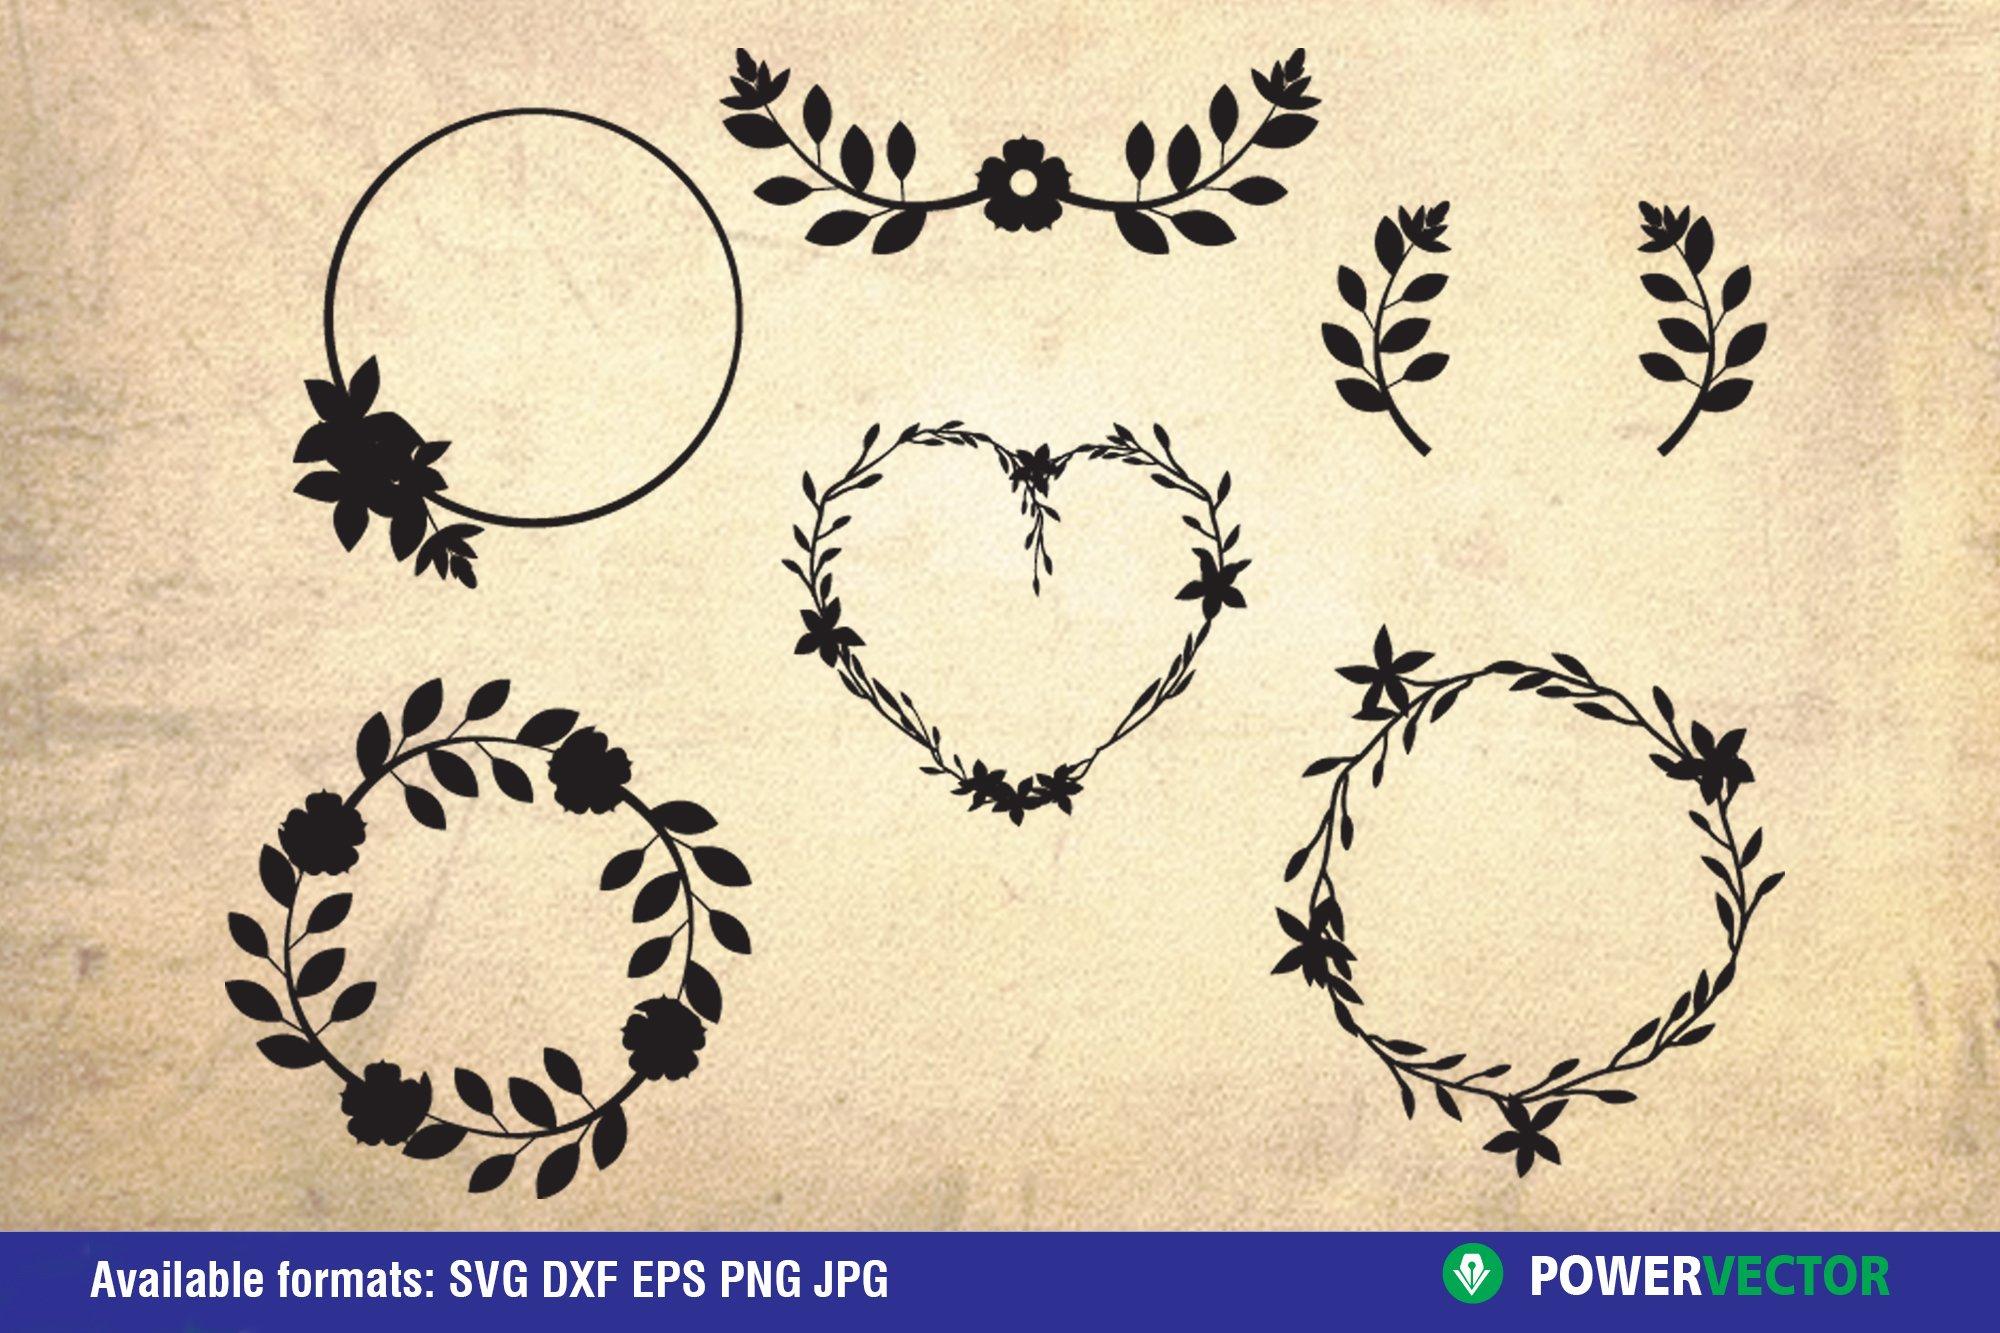 Flowers and Laurel Wreaths SVG Bundle example image 5